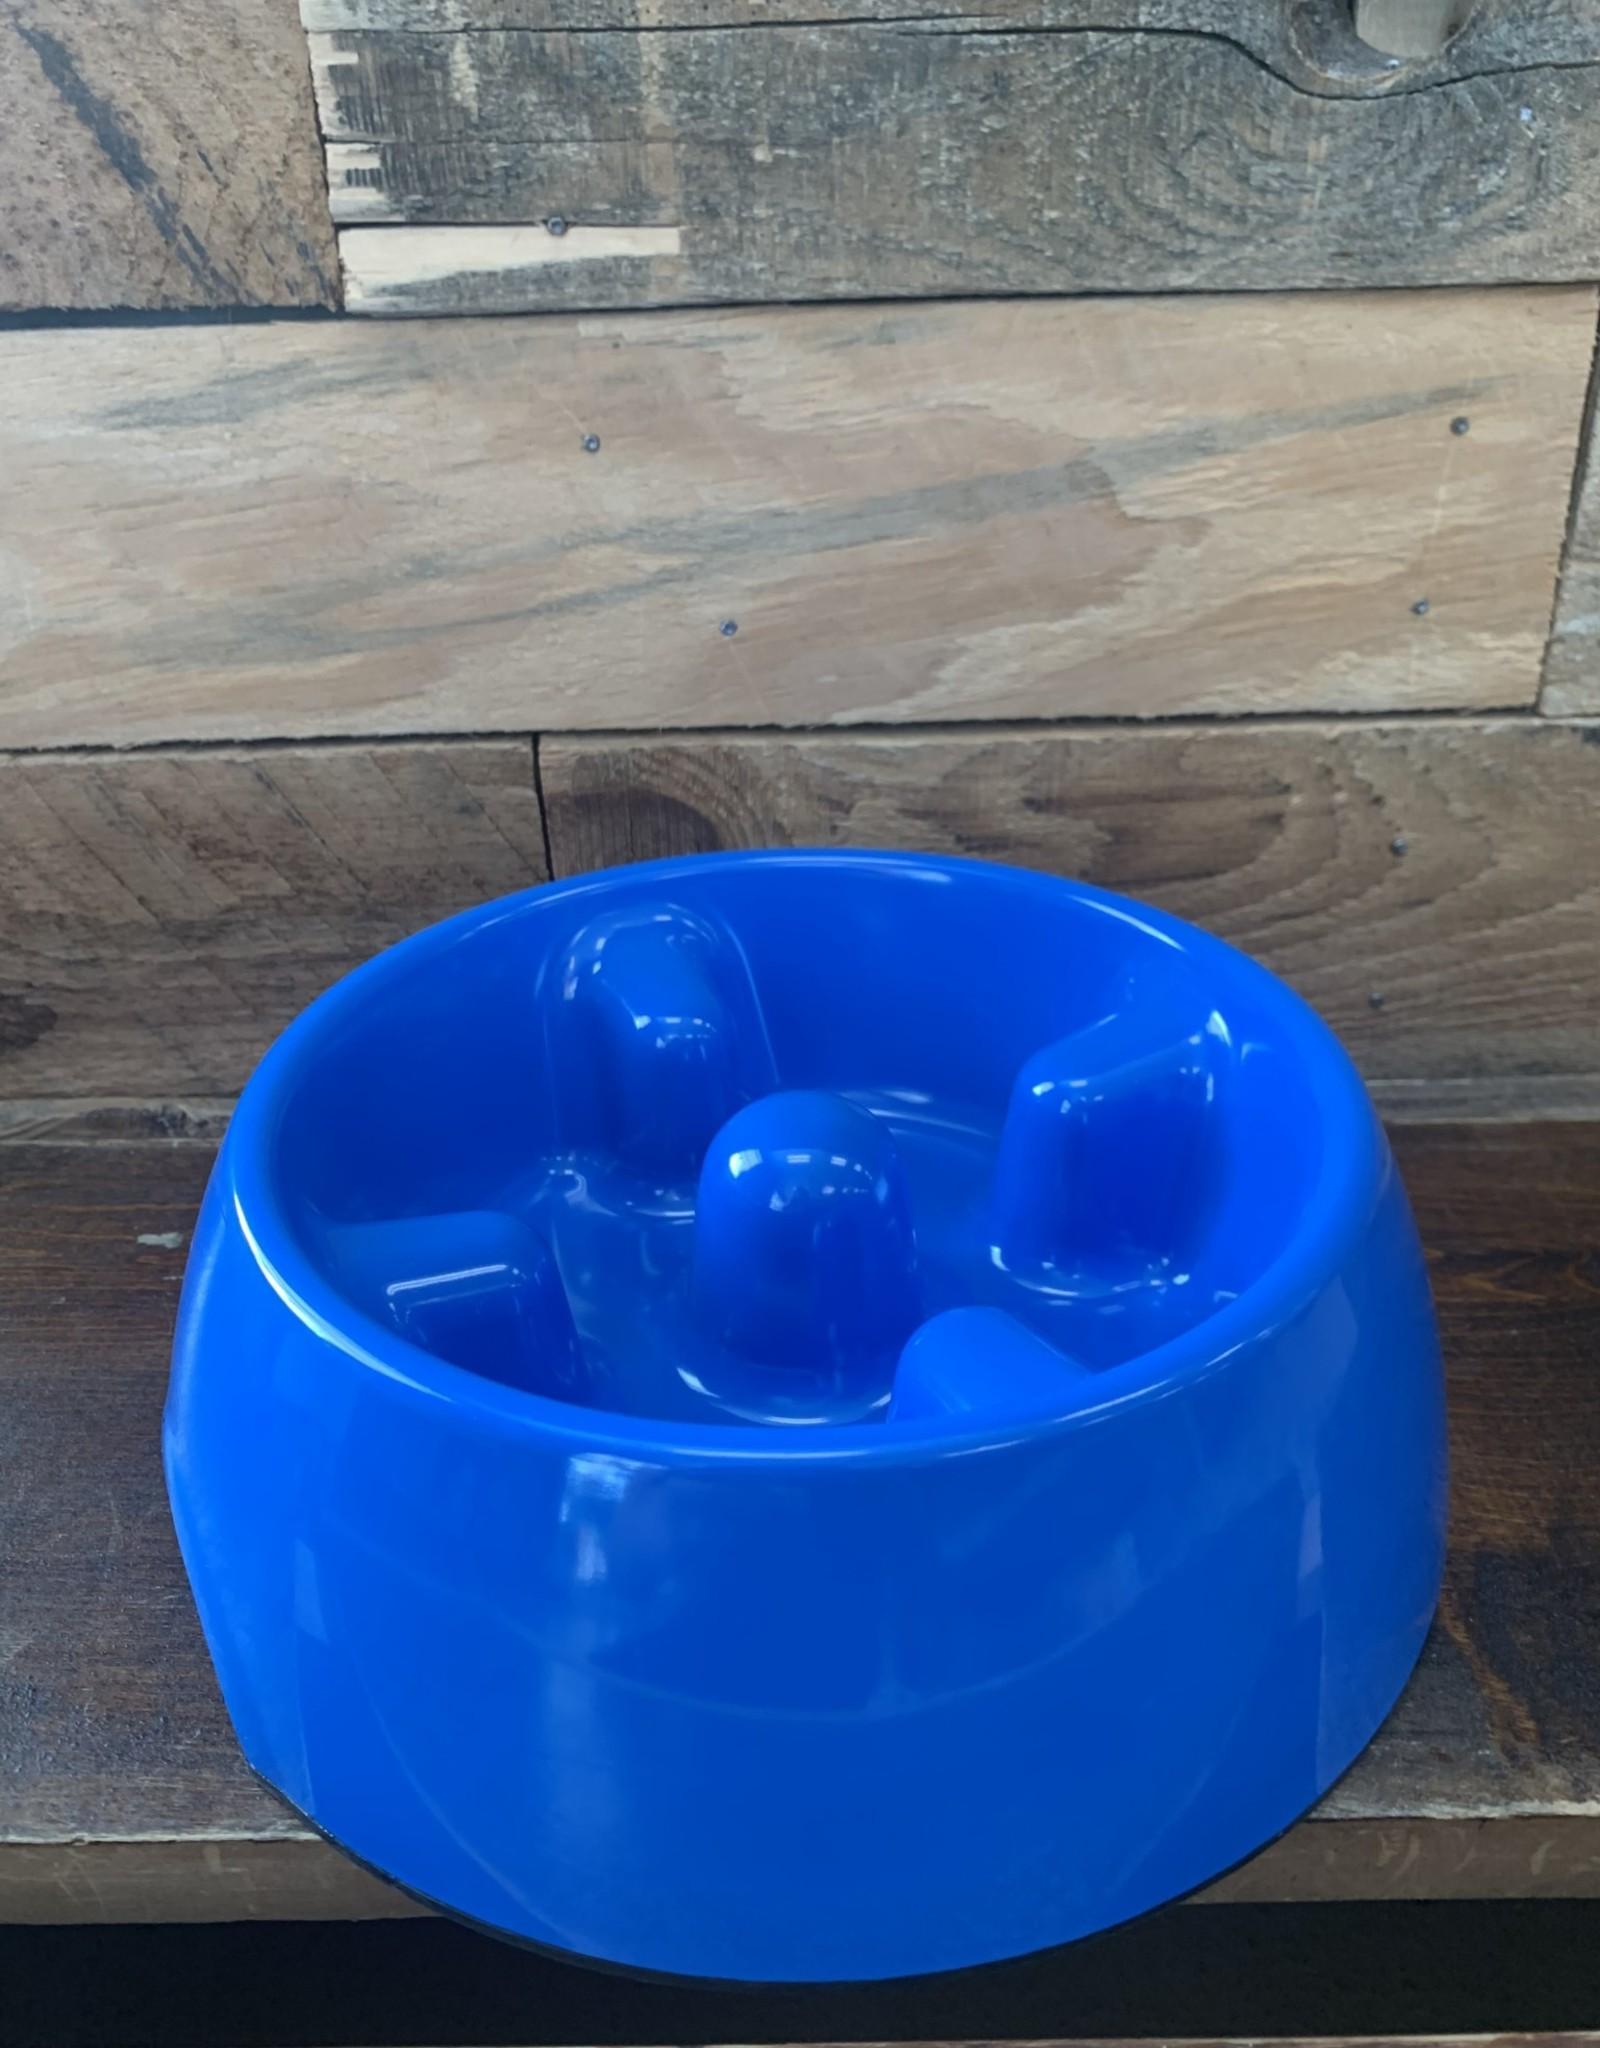 Hagen Dogit Go Slow Anti-Gulping Bowl Med. Blue